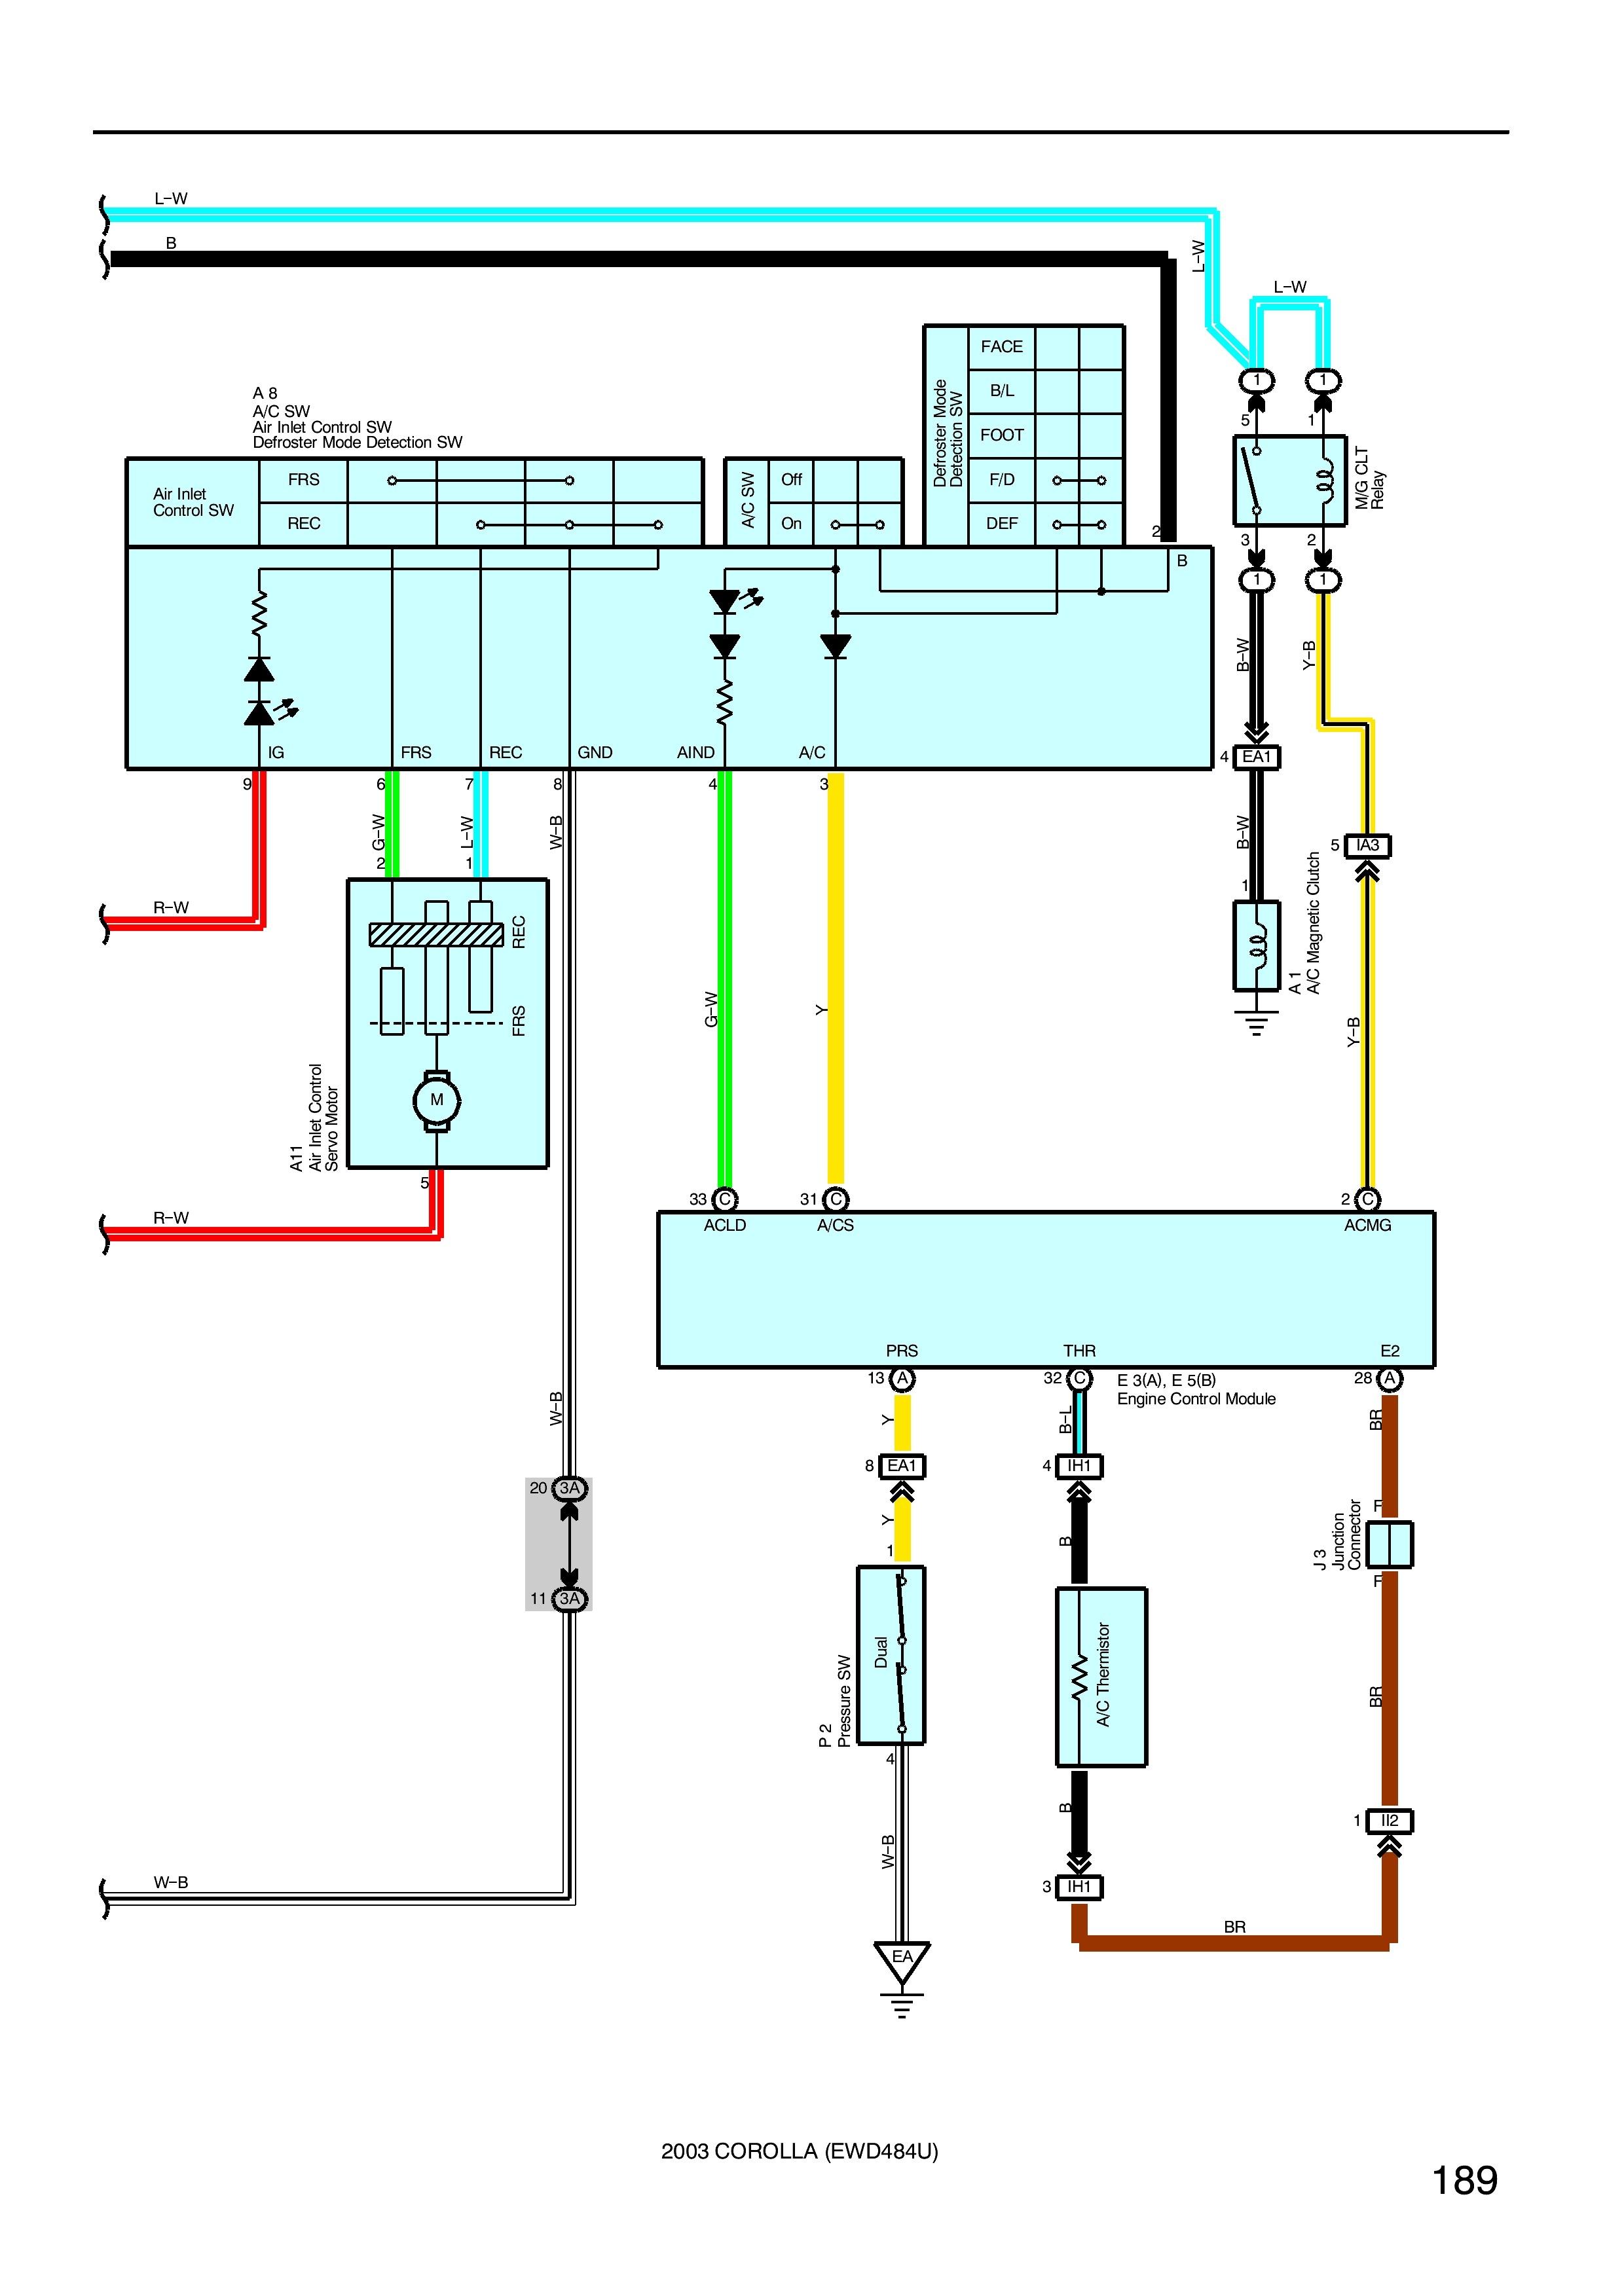 2012-08-14_211428_047ac-002 Dash Wiring Diagram on